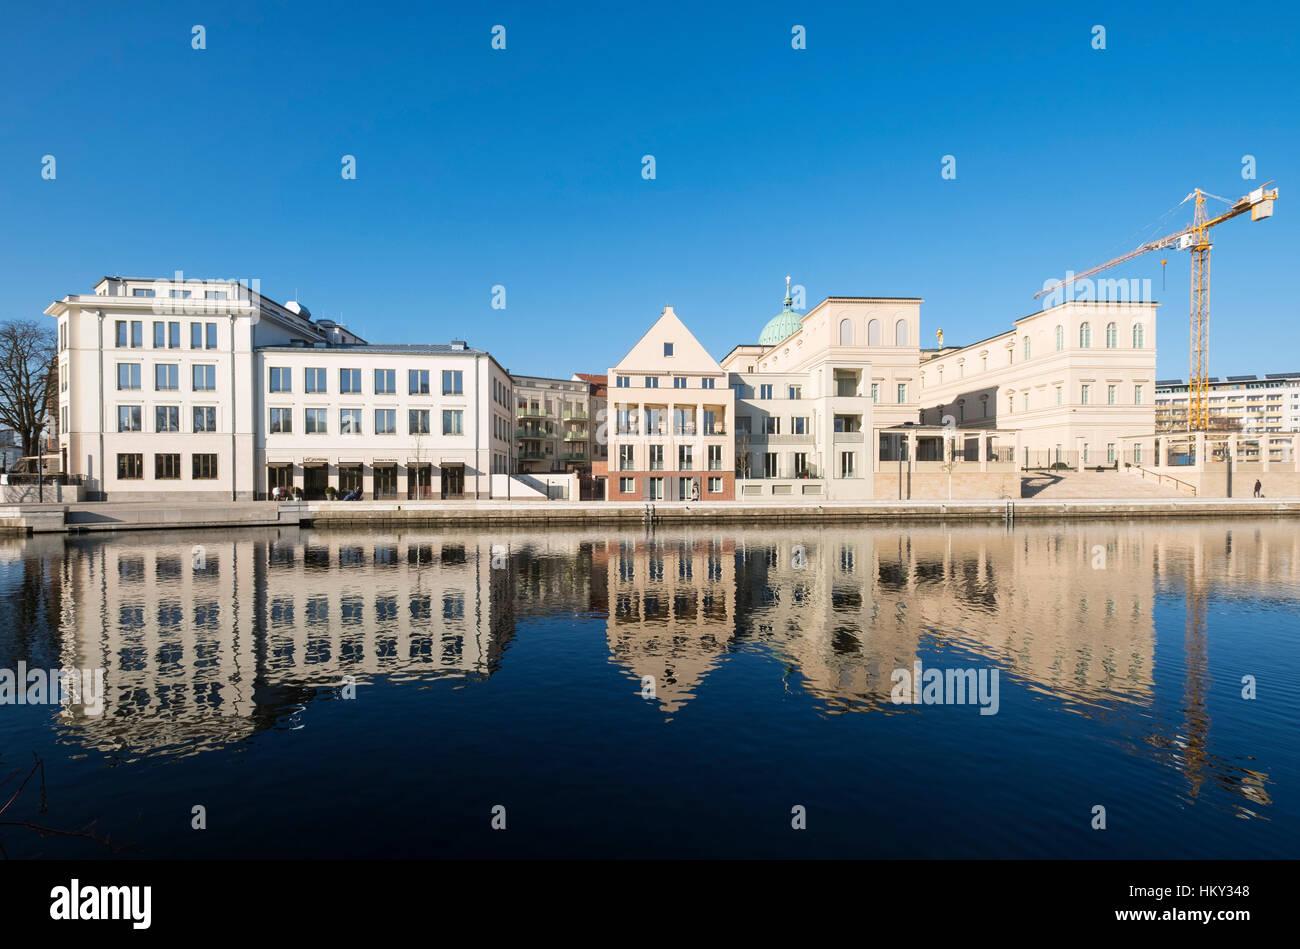 New property development and Museum Barberini on right at Otto Braun Platz Potsdam Germany - Stock Image